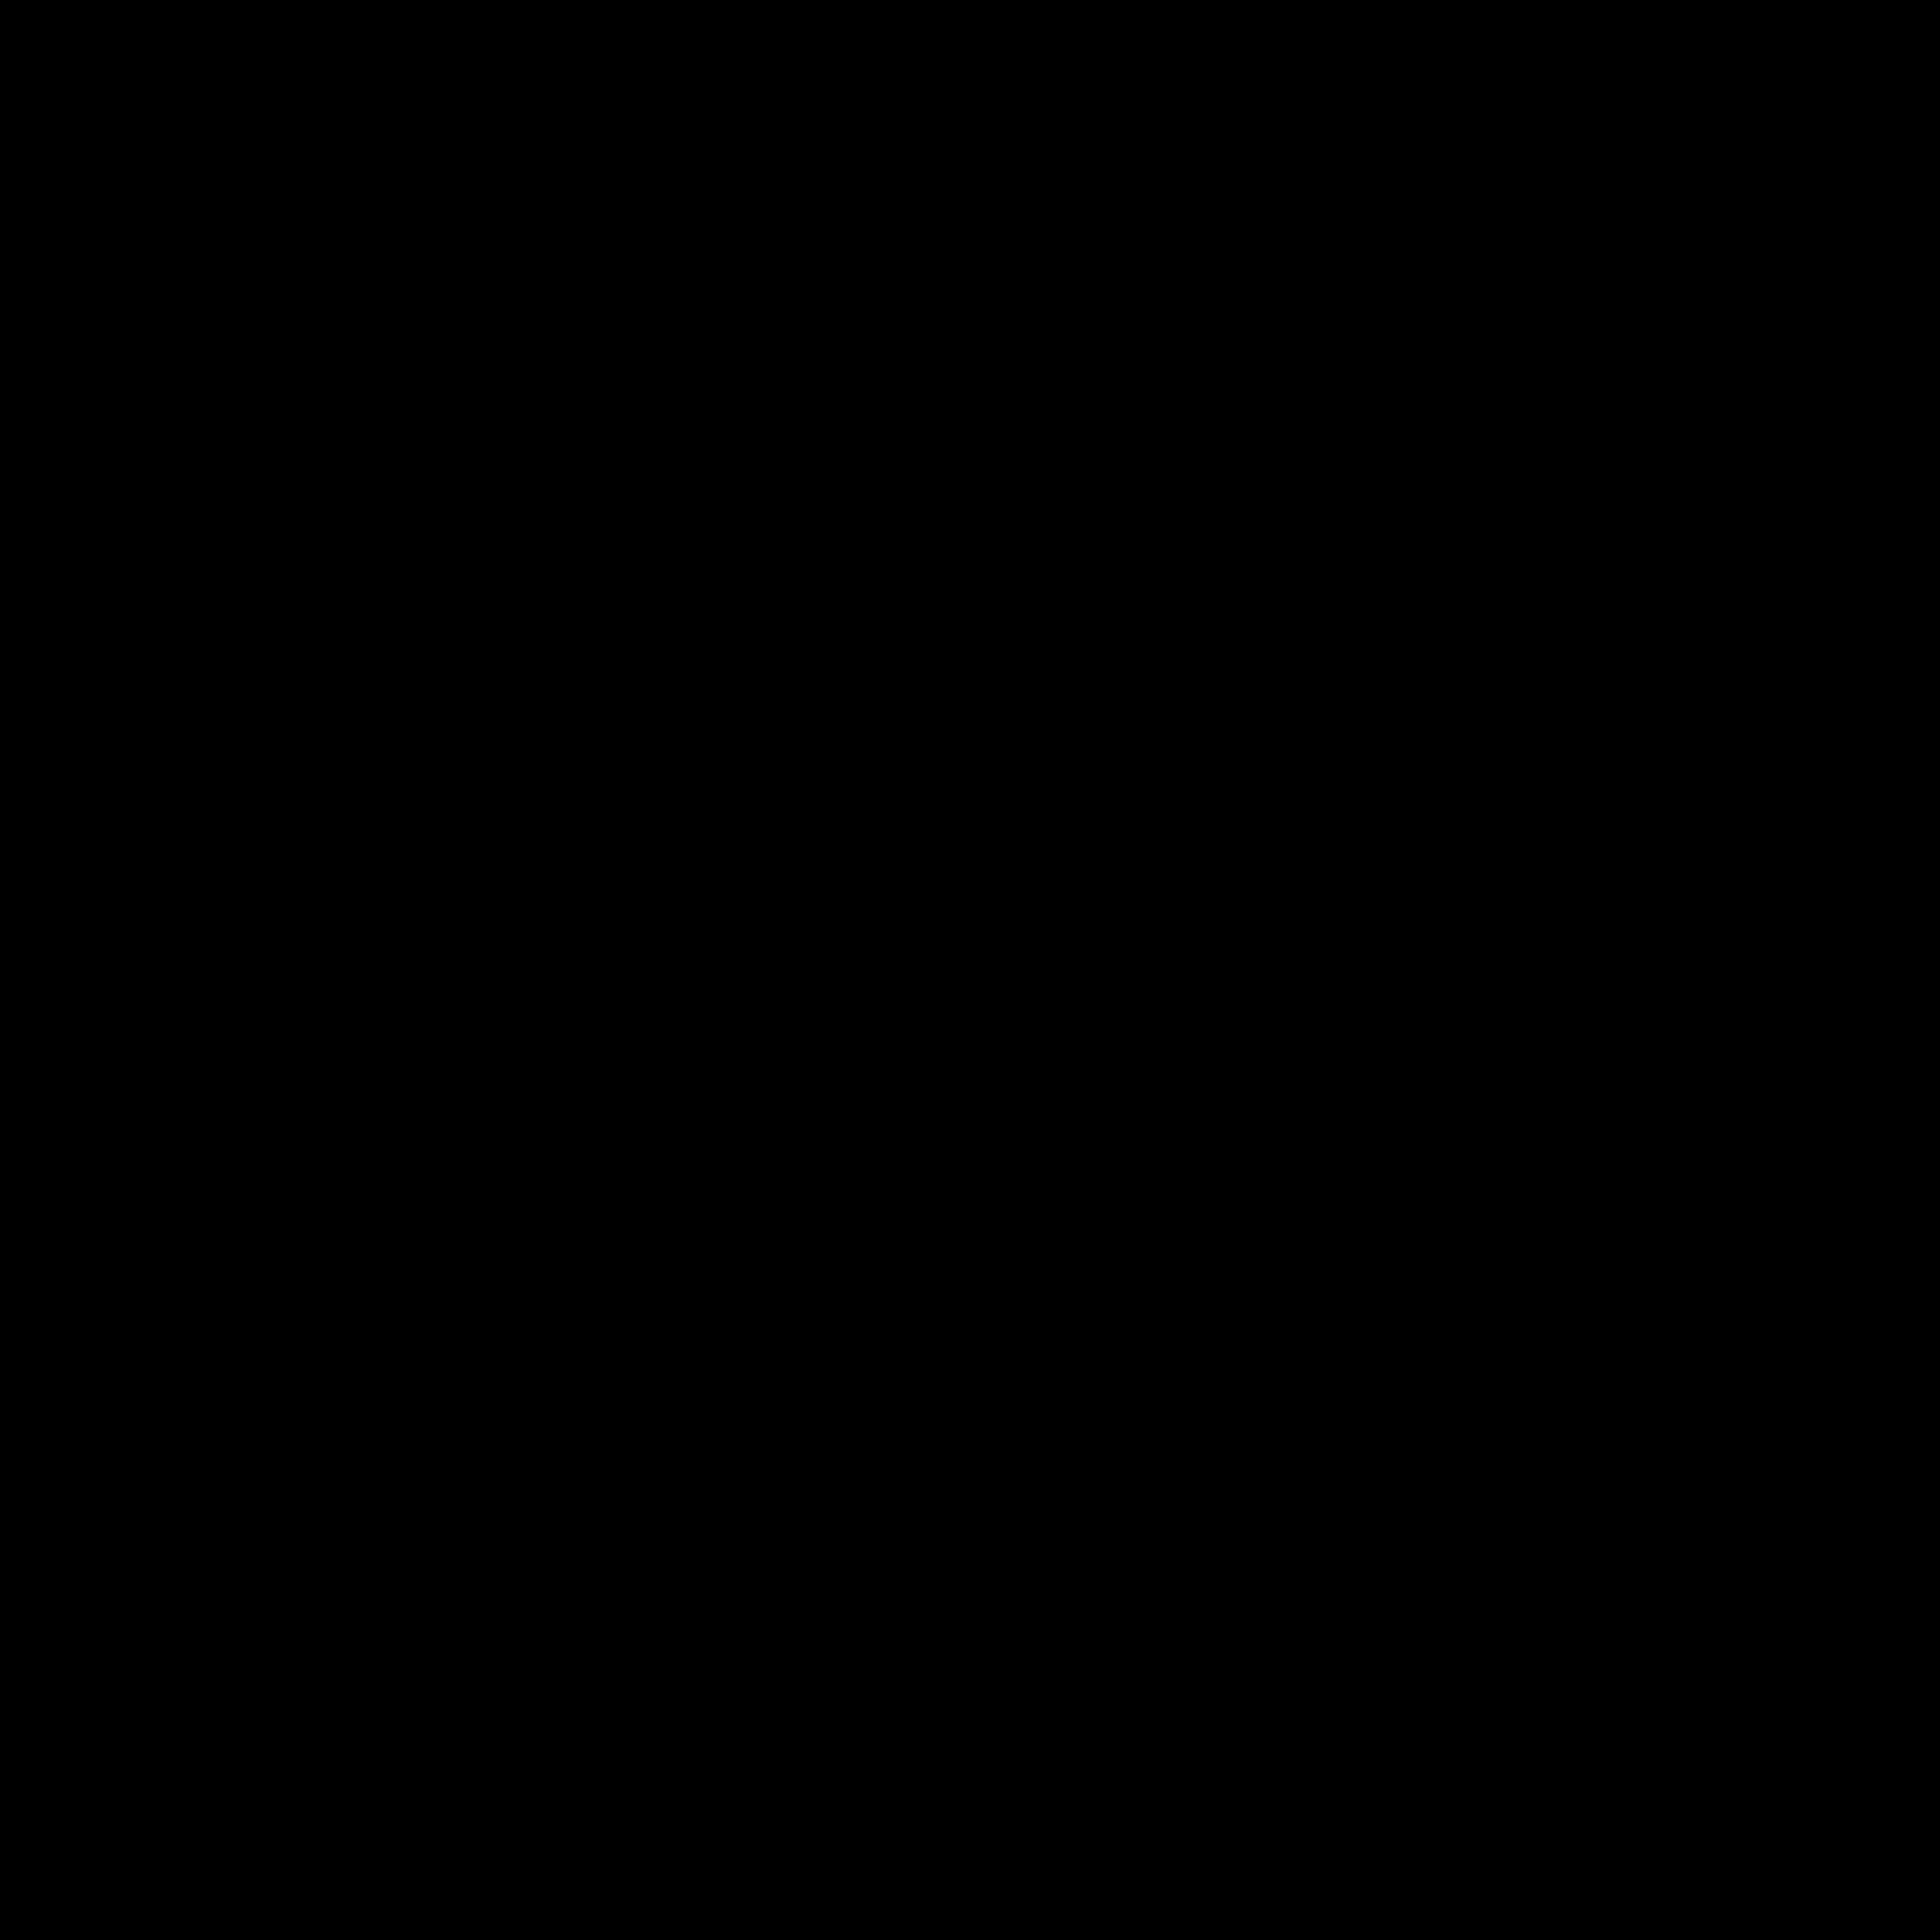 File:Square-symbol.svg - Wikimedia Commons